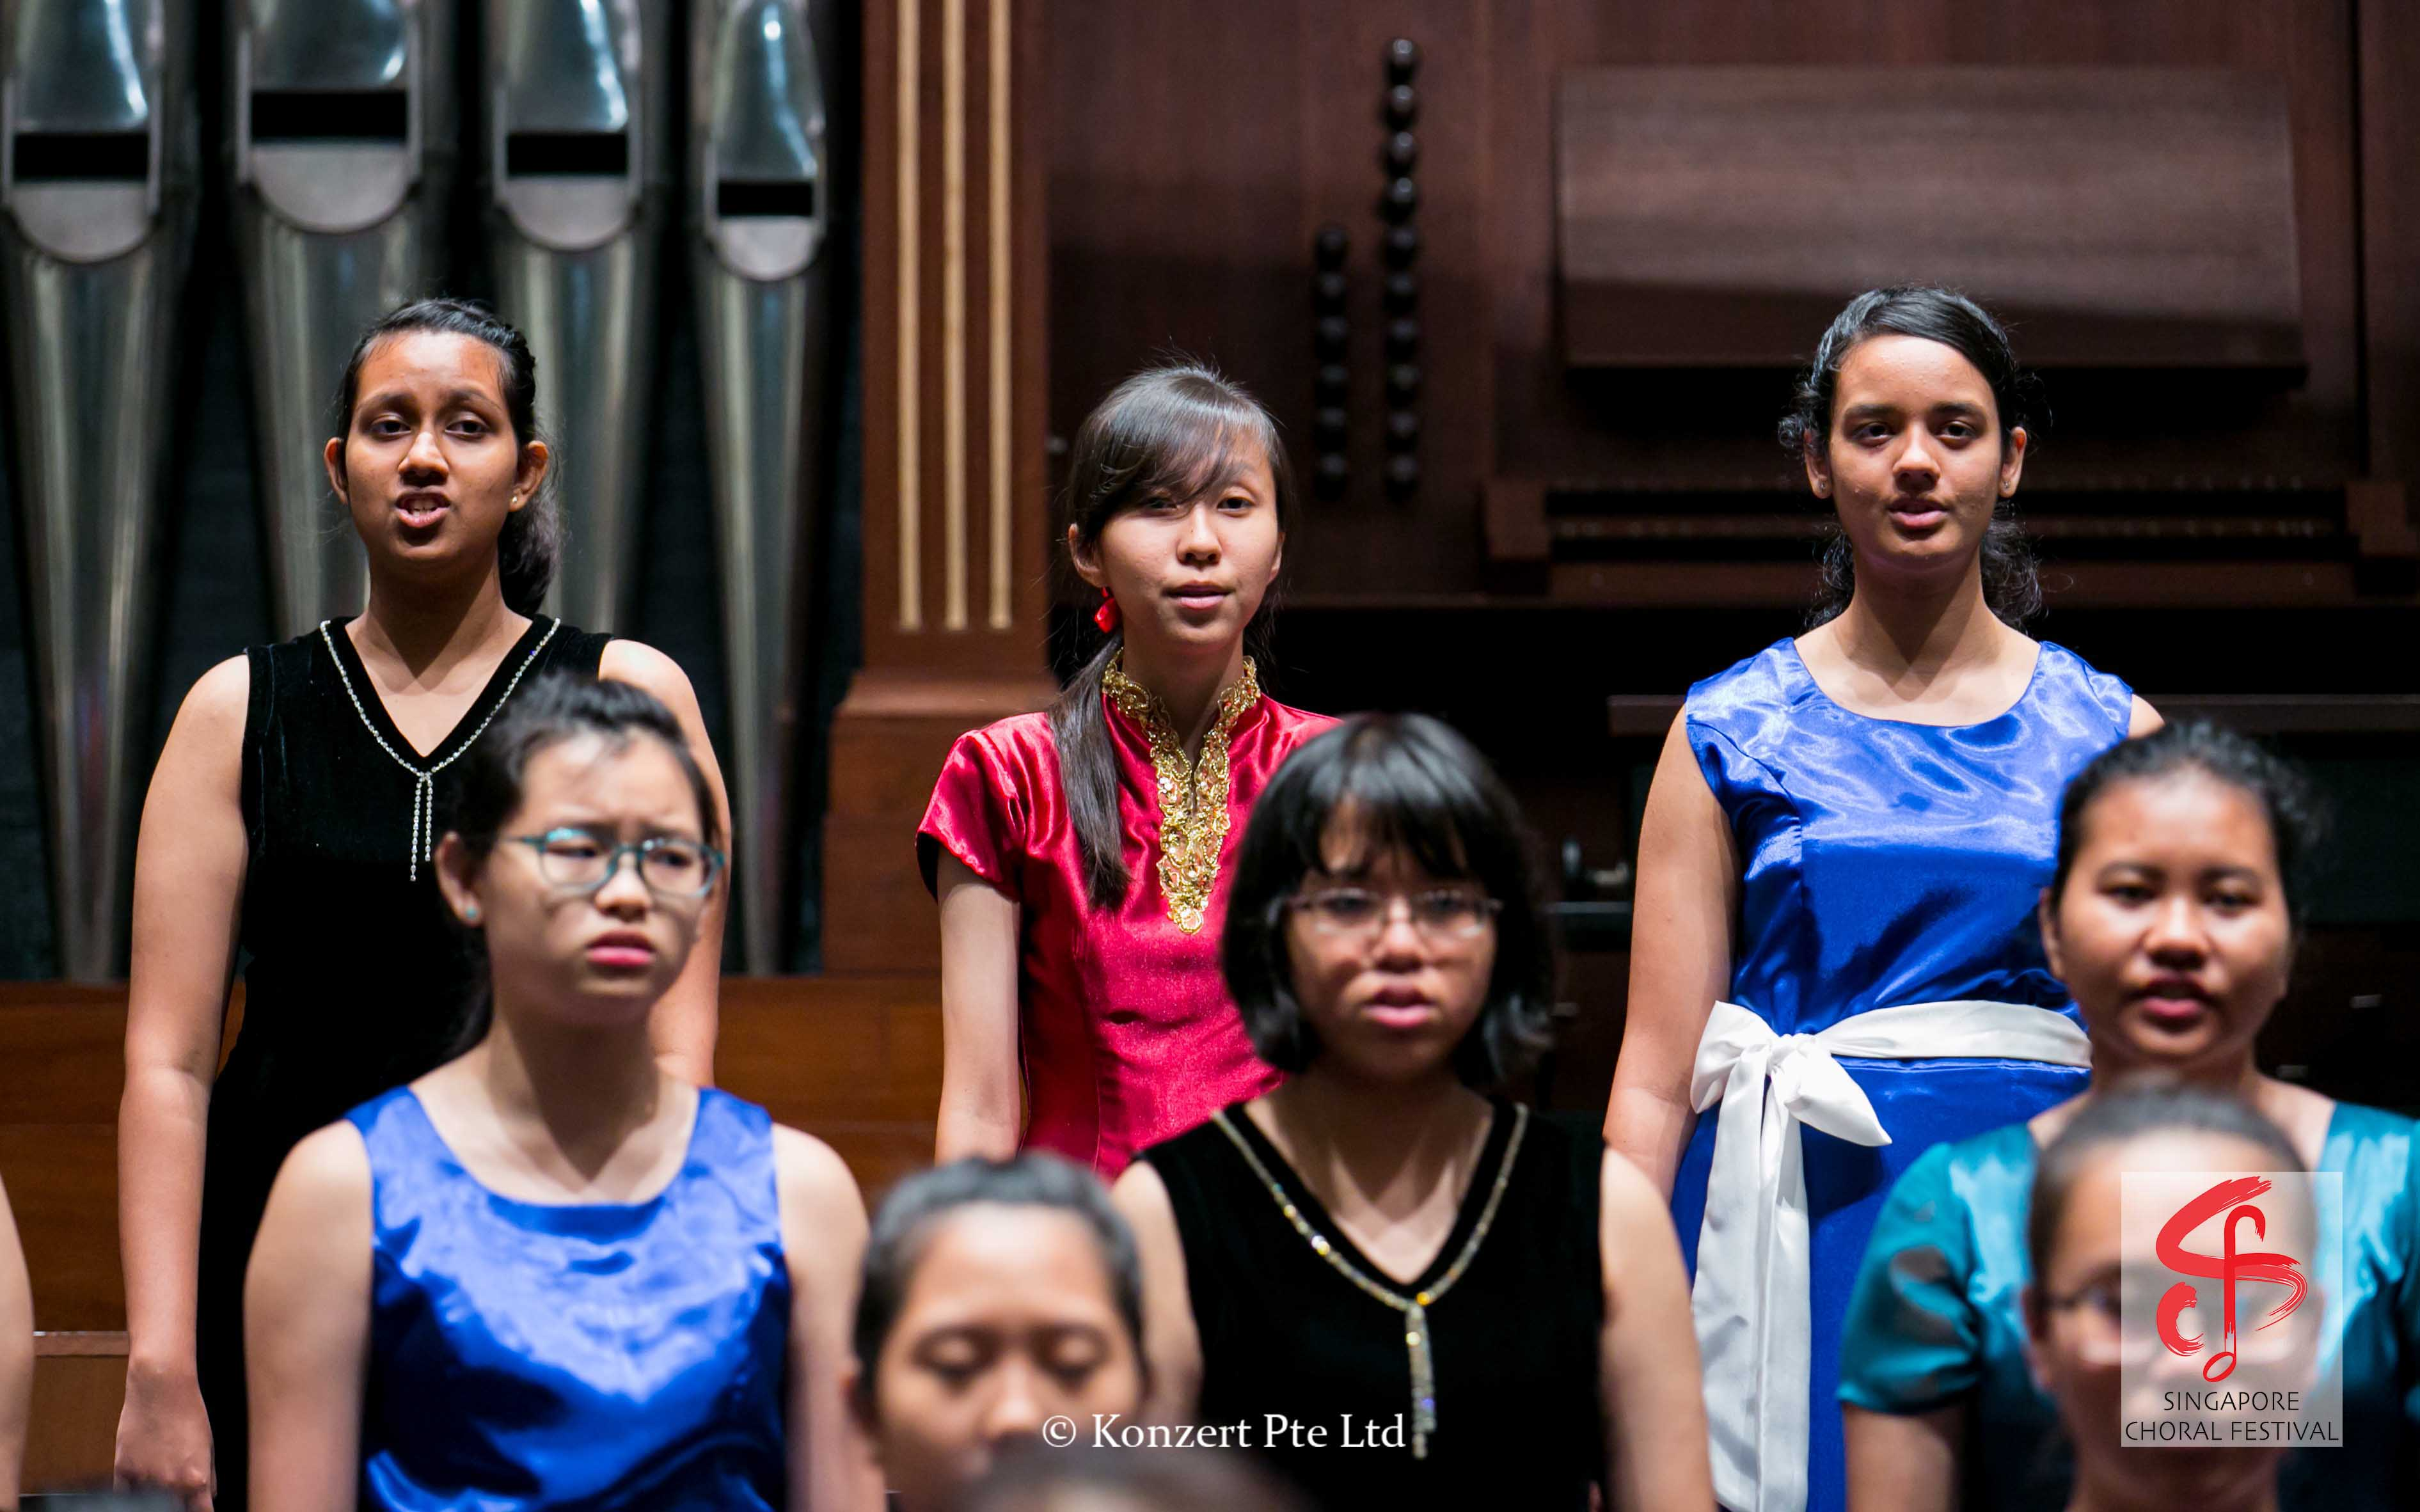 Singapore Choral Festival 7-8-15 (162).jpg